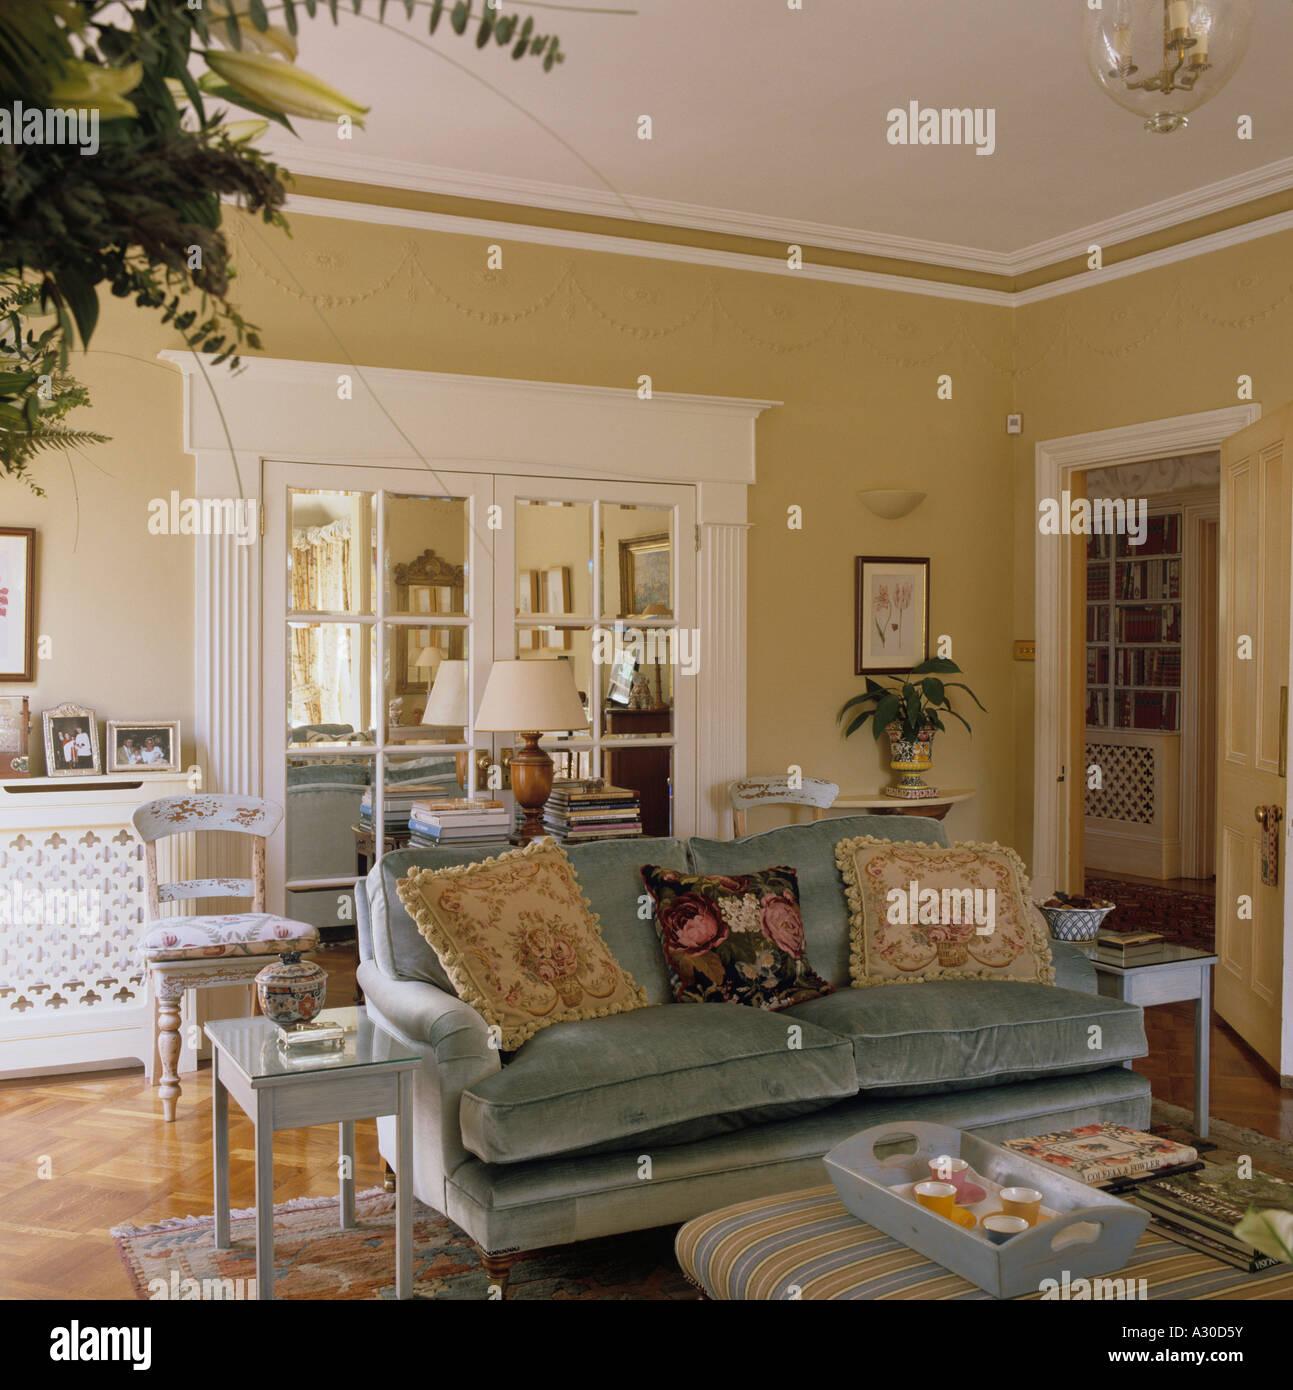 Living room with velvet sofa and mirror panelled door & Living room with velvet sofa and mirror panelled door Stock Photo ...